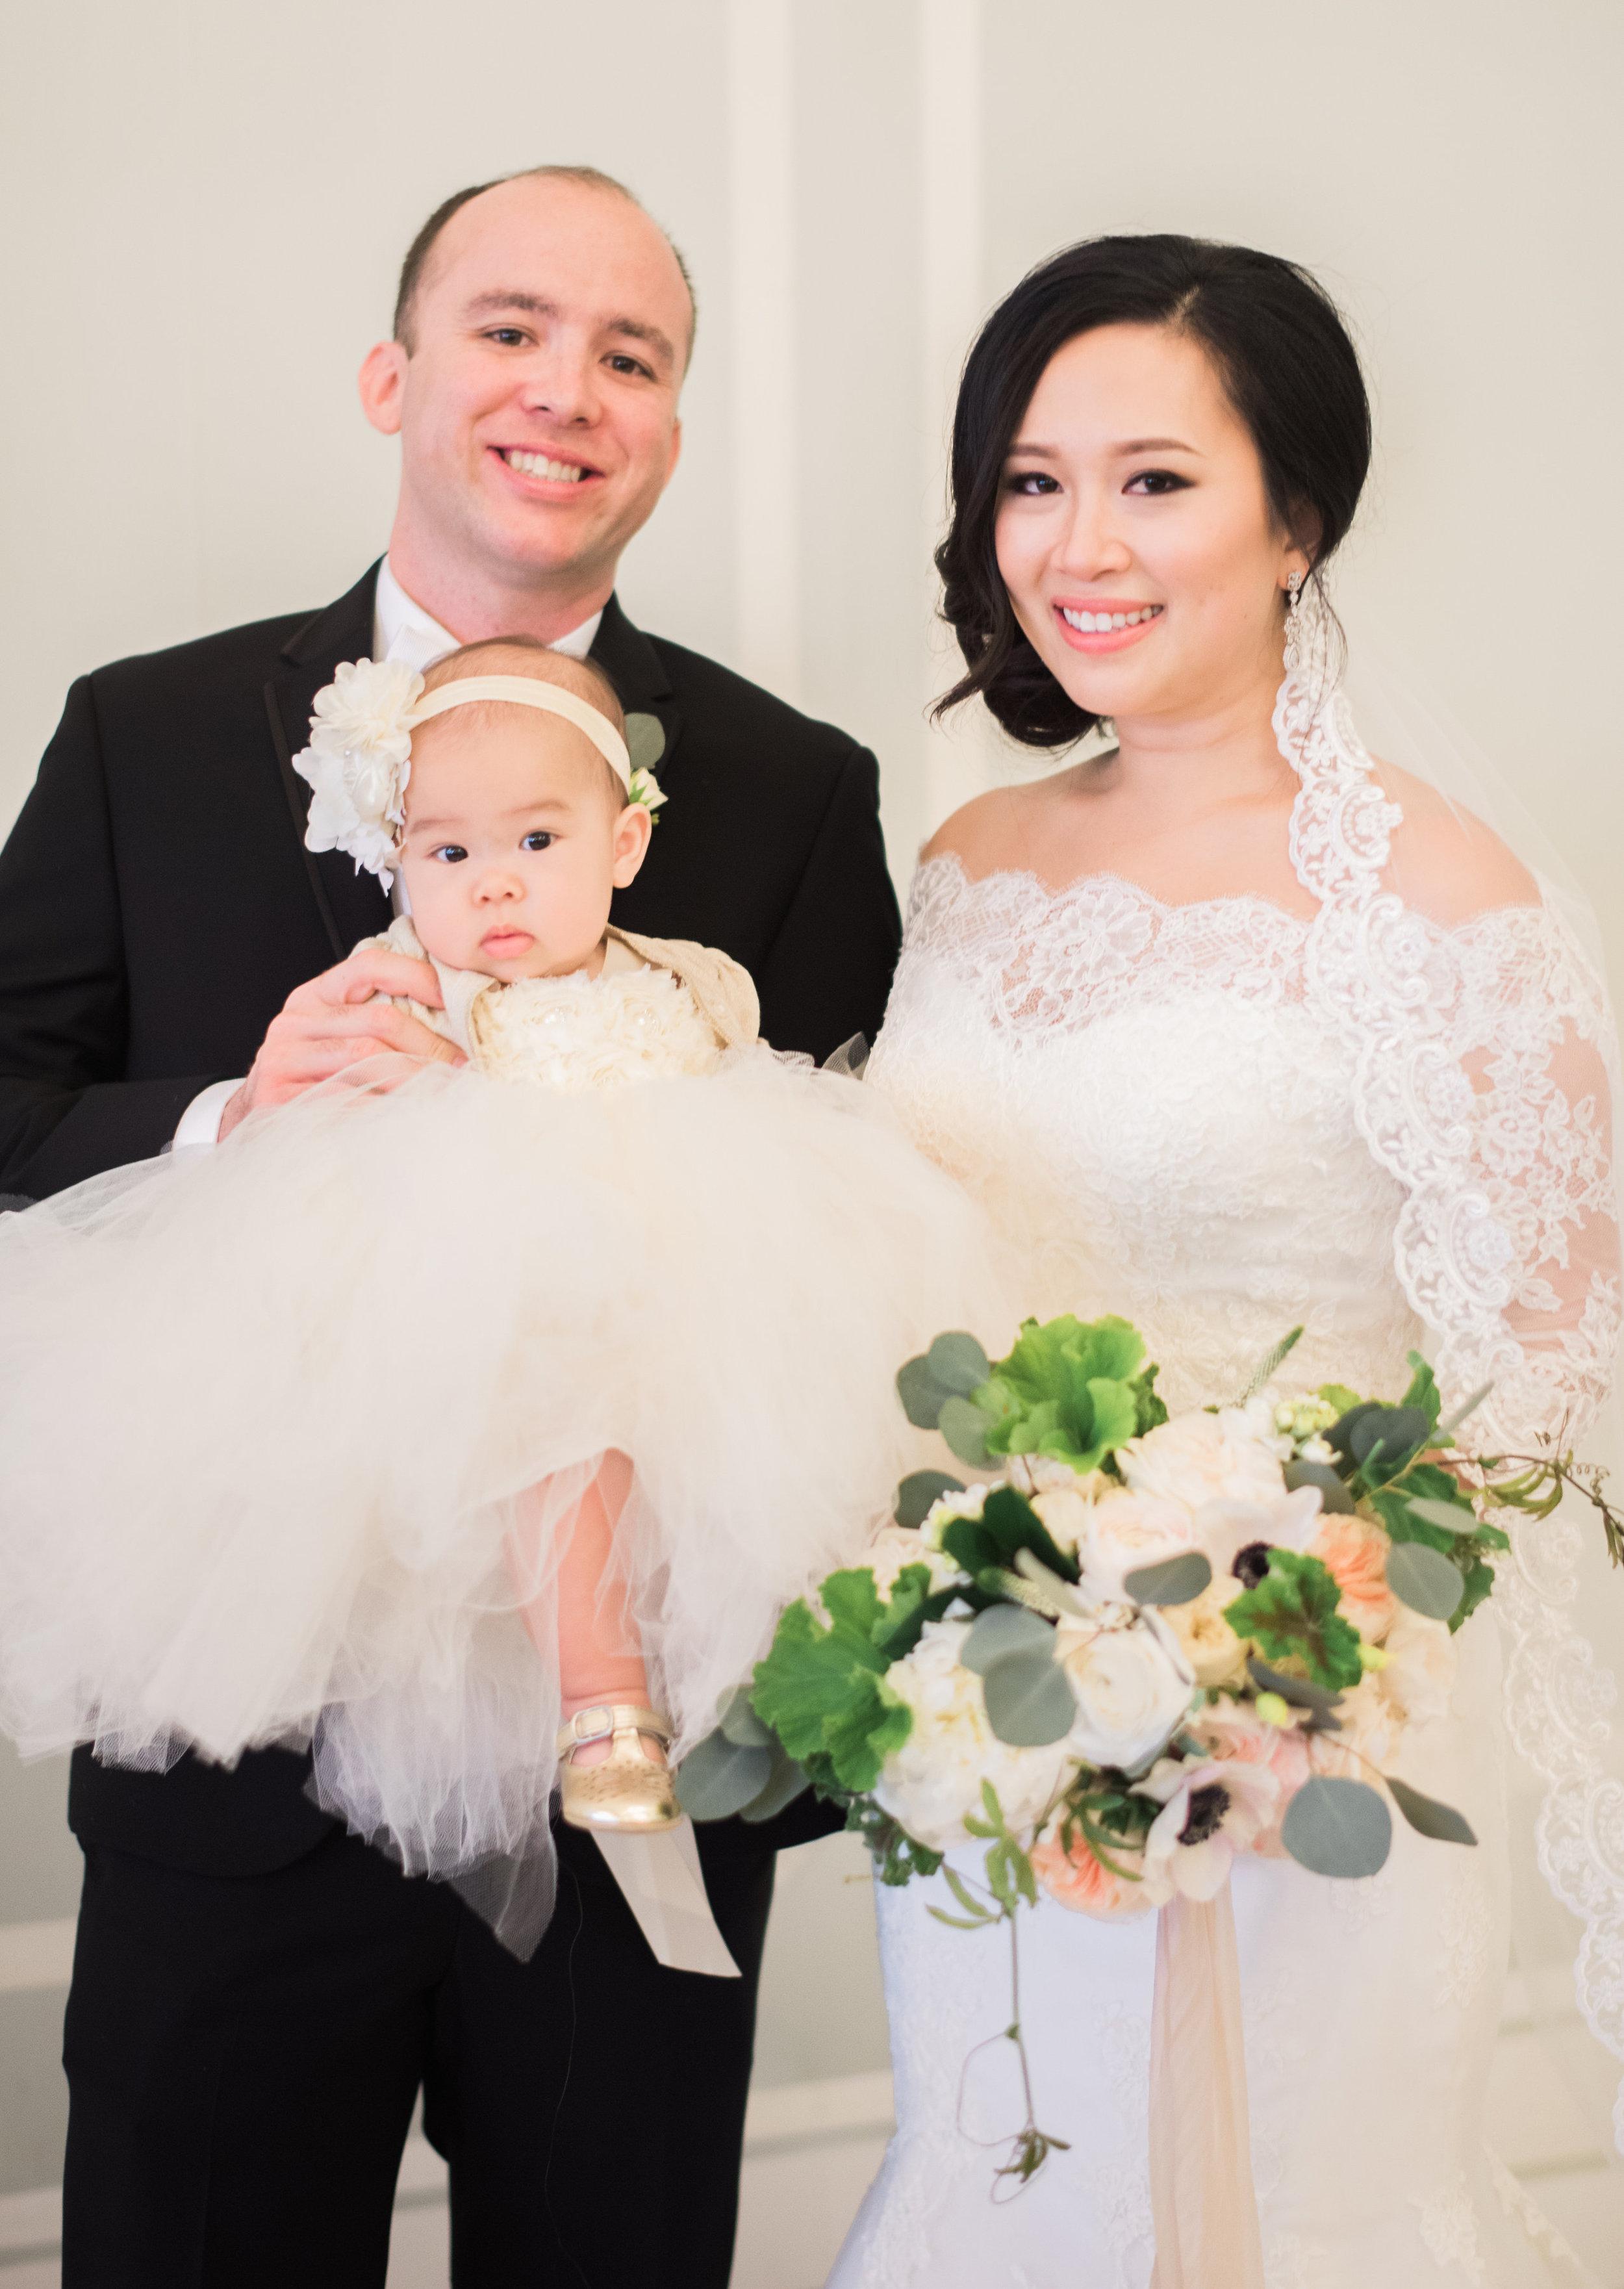 ASHLEYSUN_WEDDING_SANTAMONICA-236.jpg